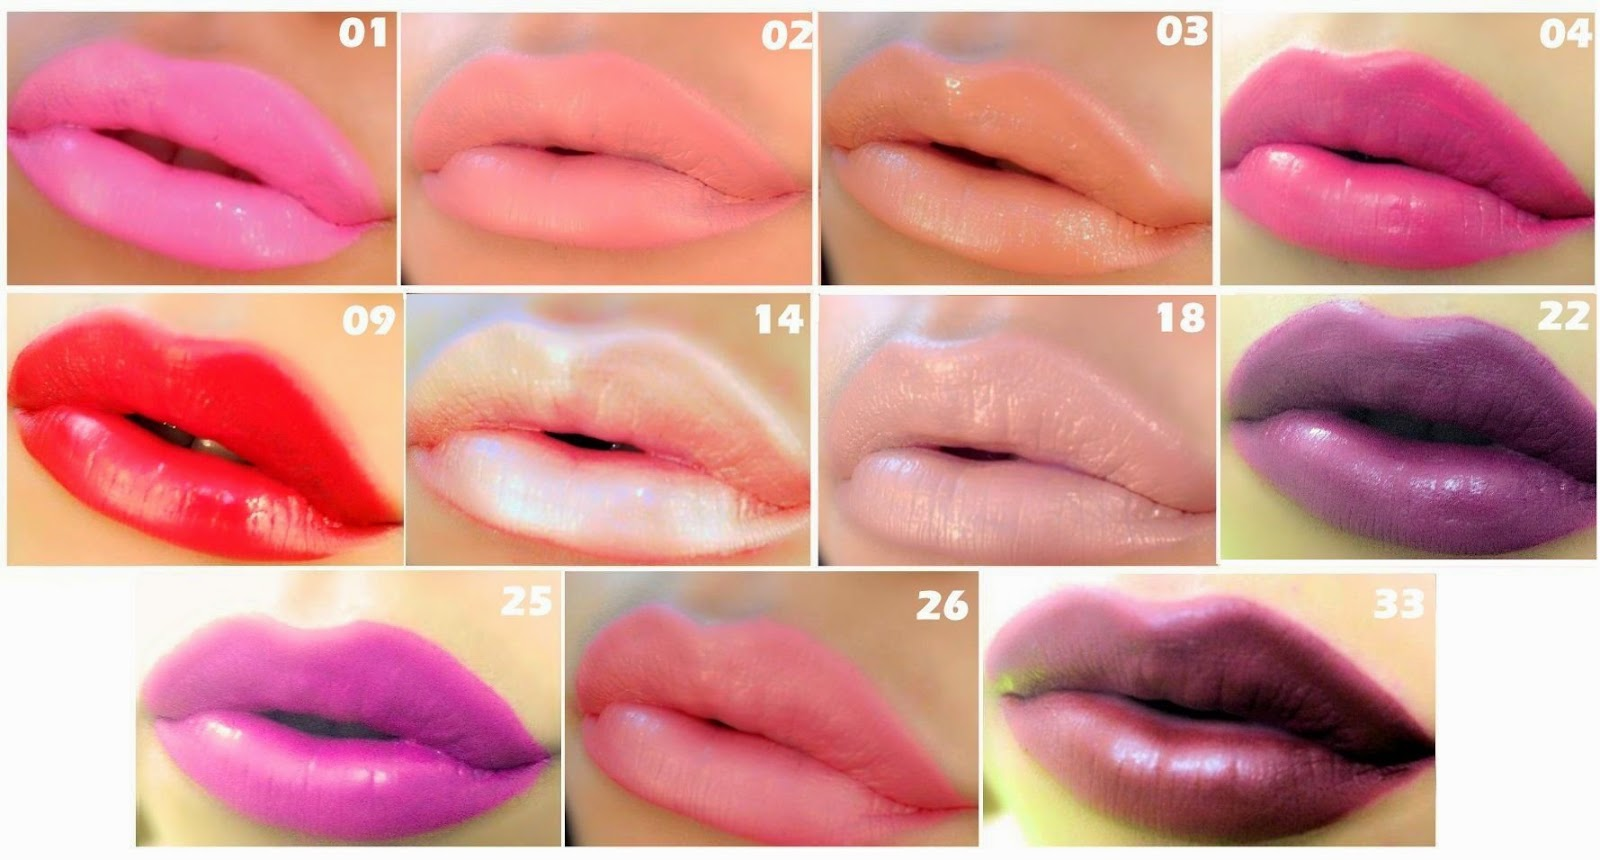 product rock roll matte lipstick